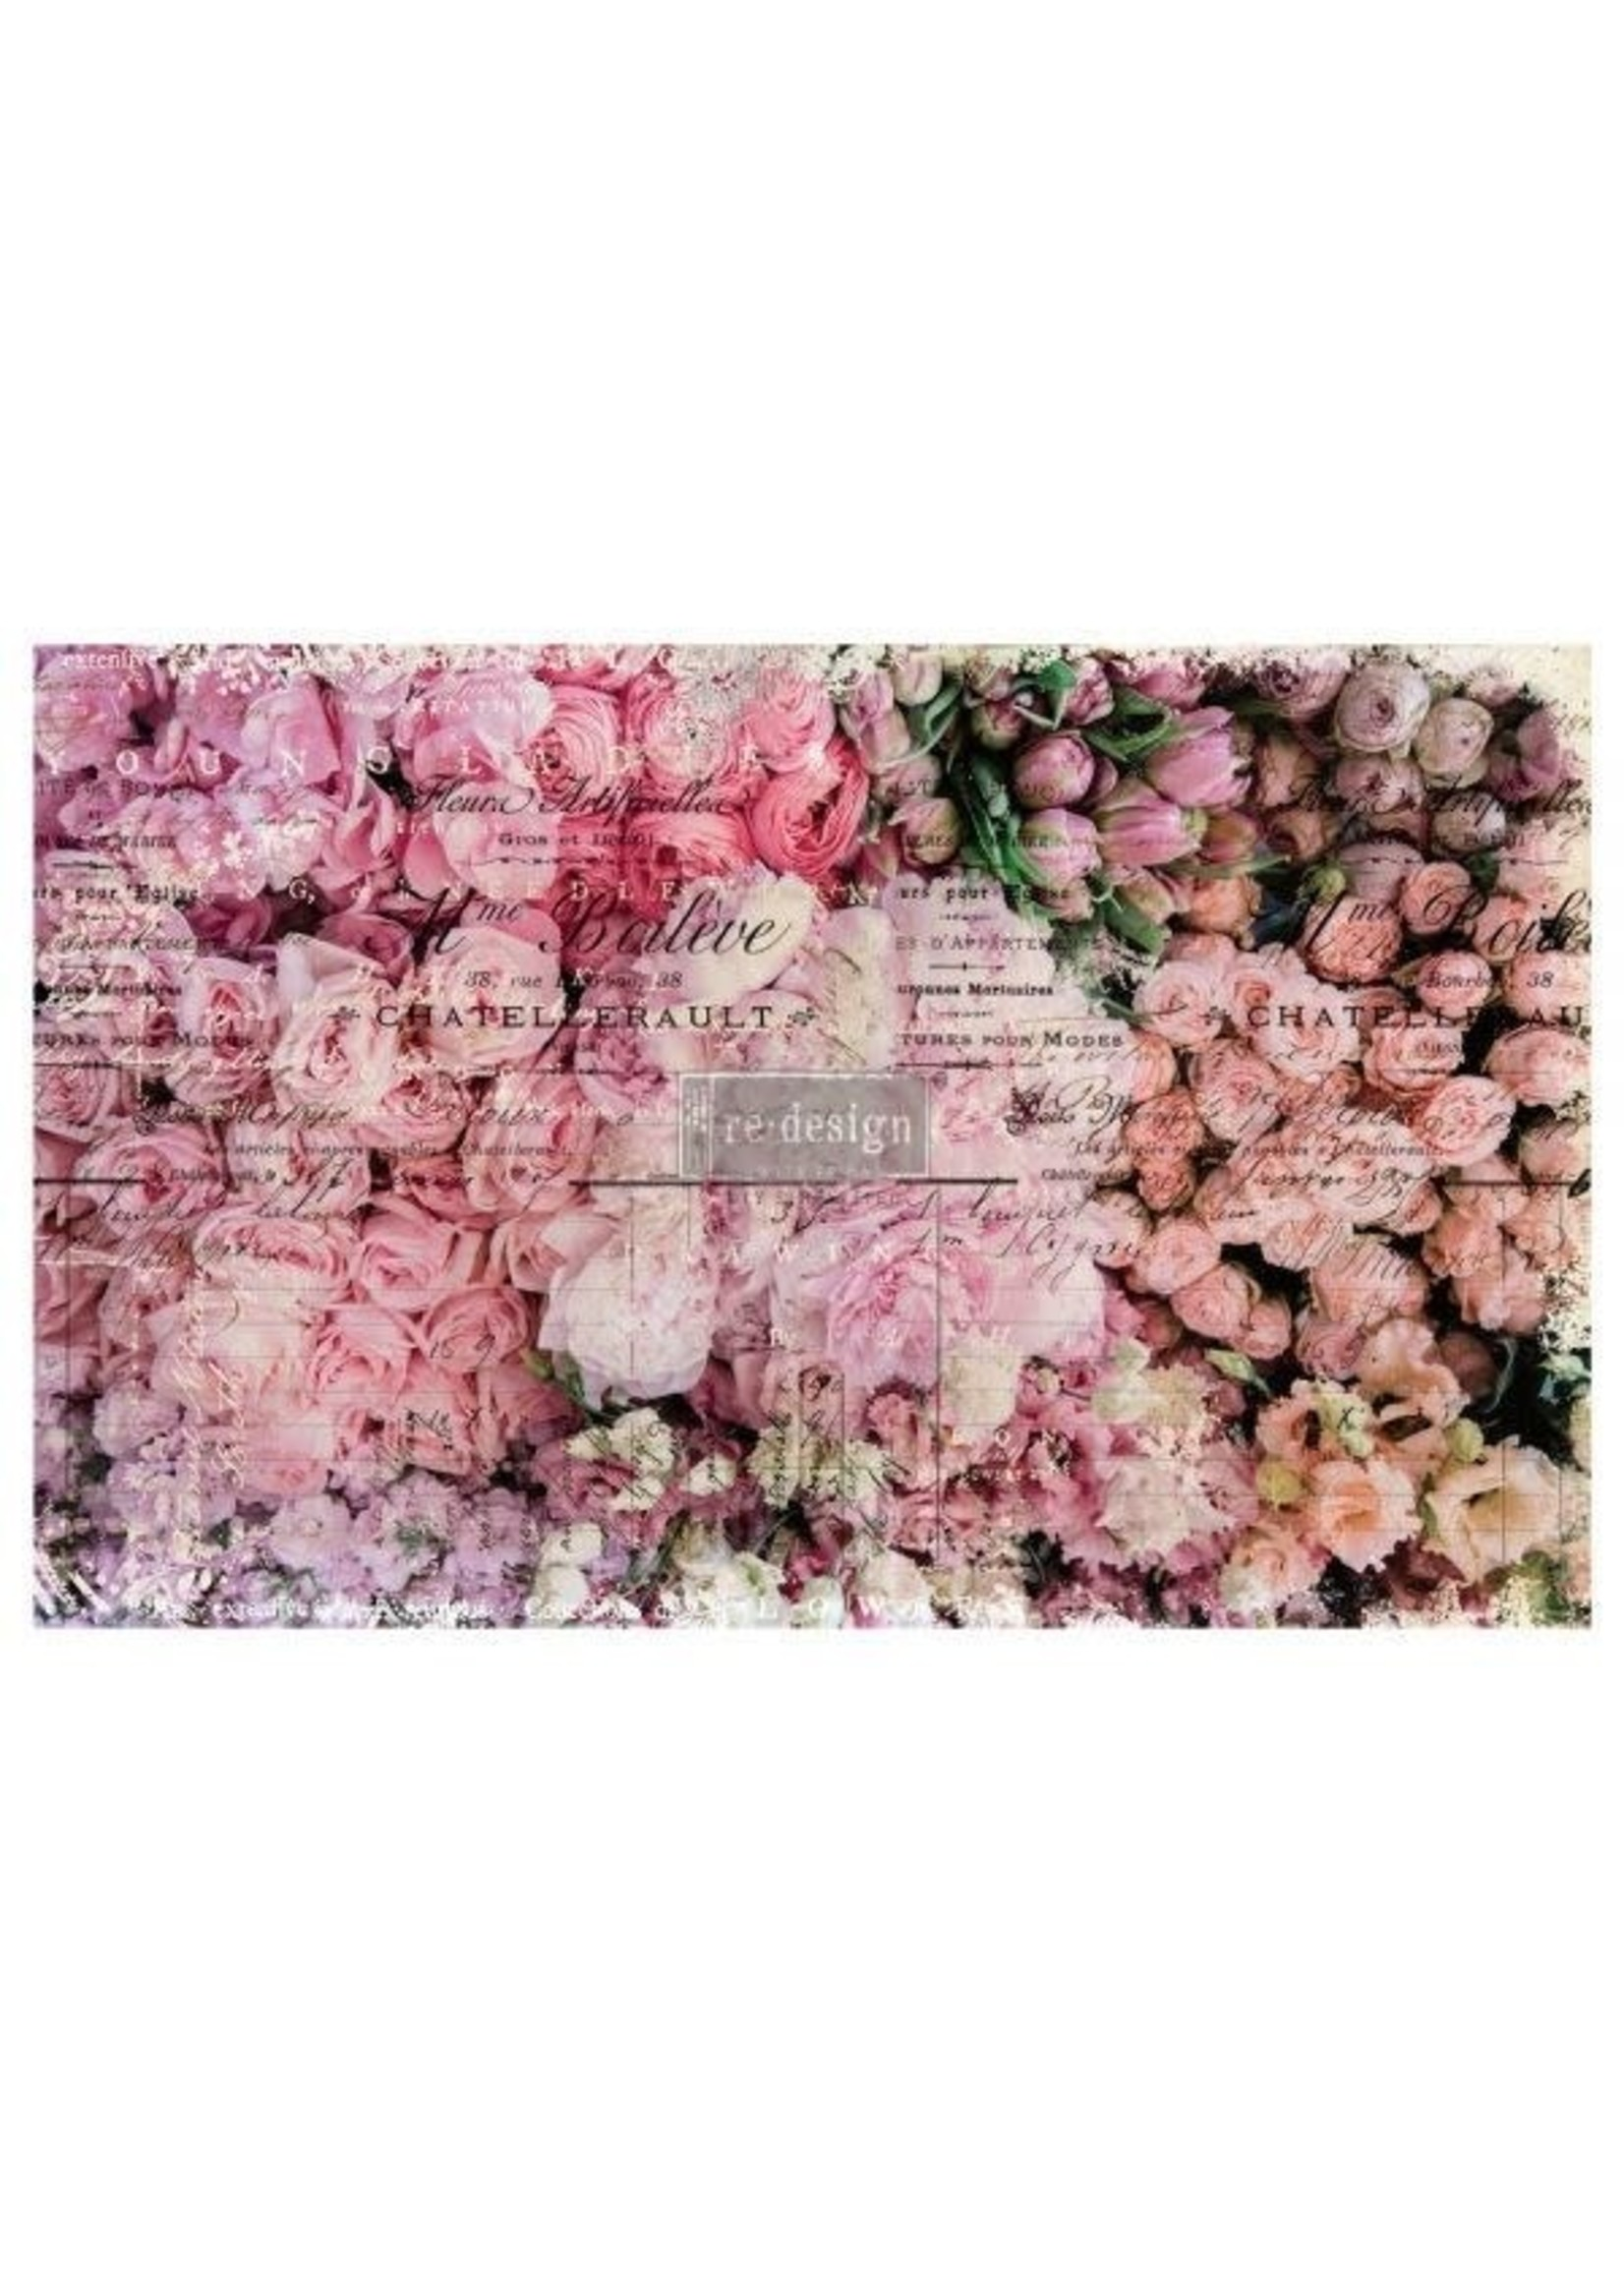 Re-Design with Prima® Flower Market Re·Design with Prima® Decoupage Tissue Paper